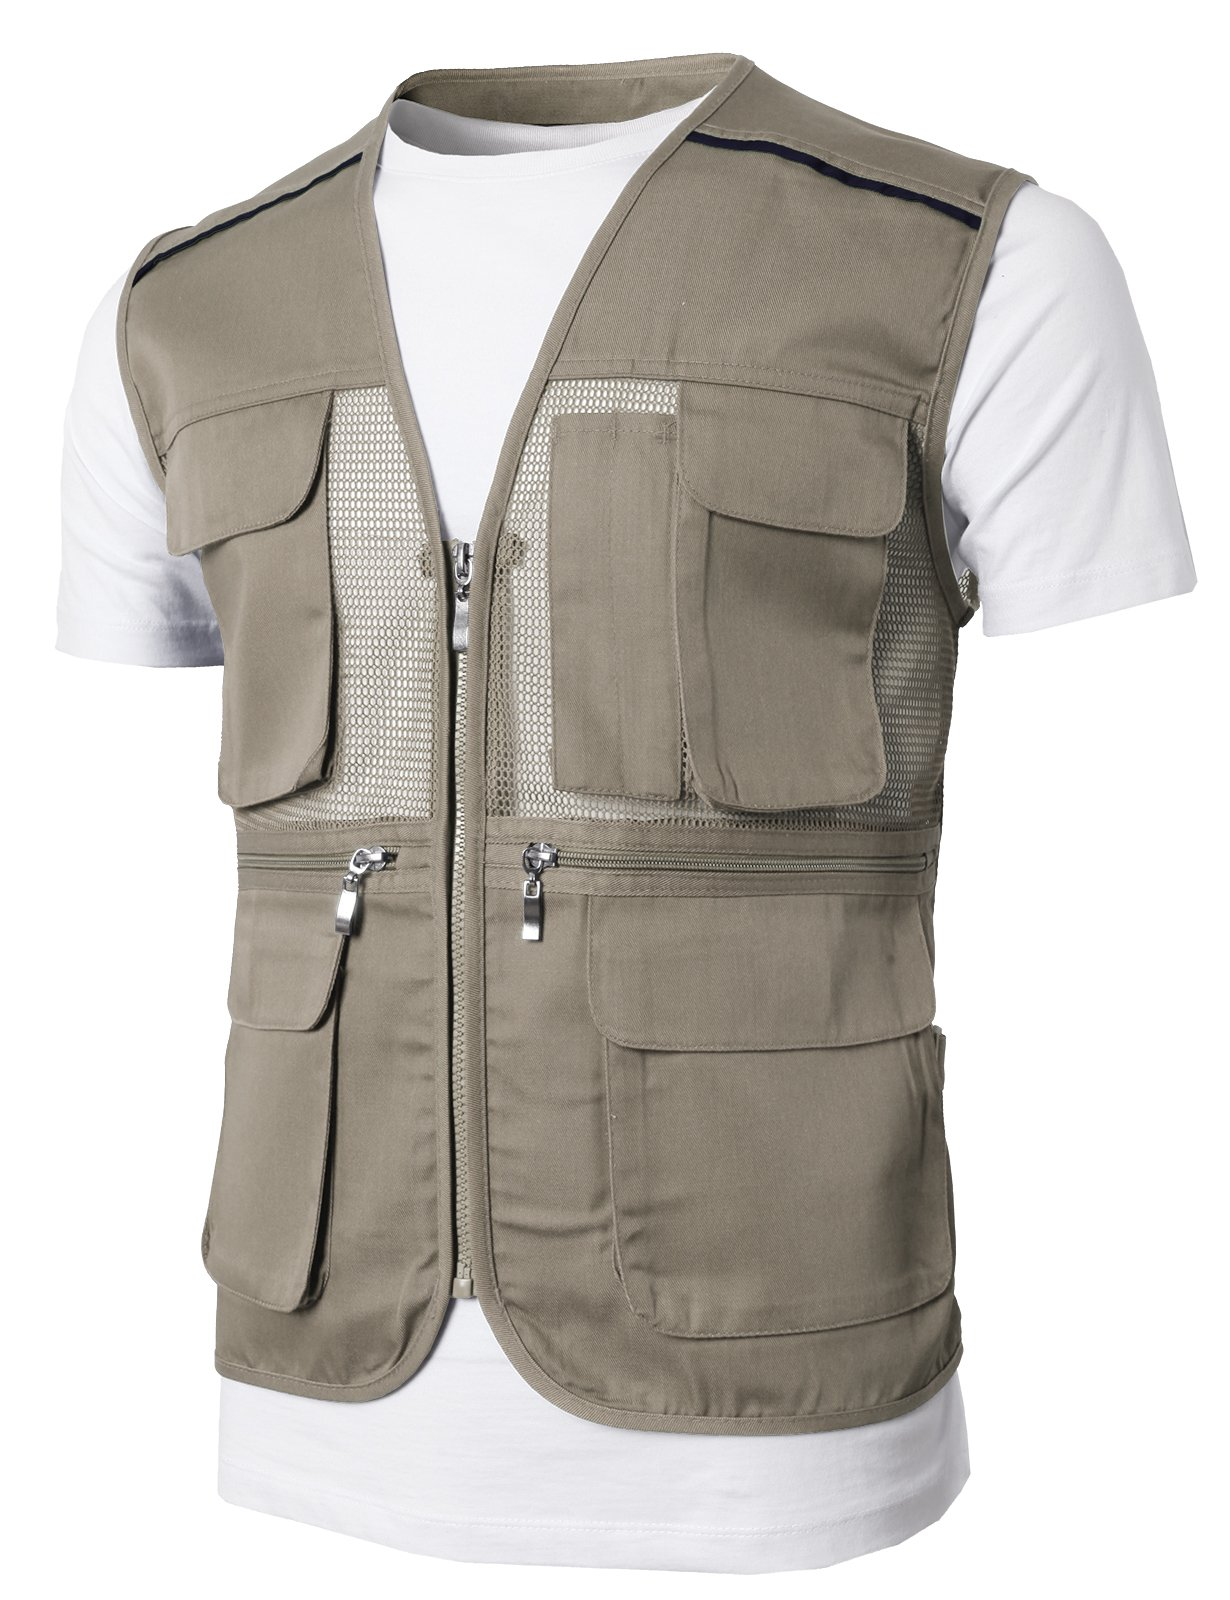 H2H Men's Outdoor Multifunction Multi-Pocket Mesh Fishing Vest of Line Point Beige US 2XL/Asia 3XL (KMOV0146)